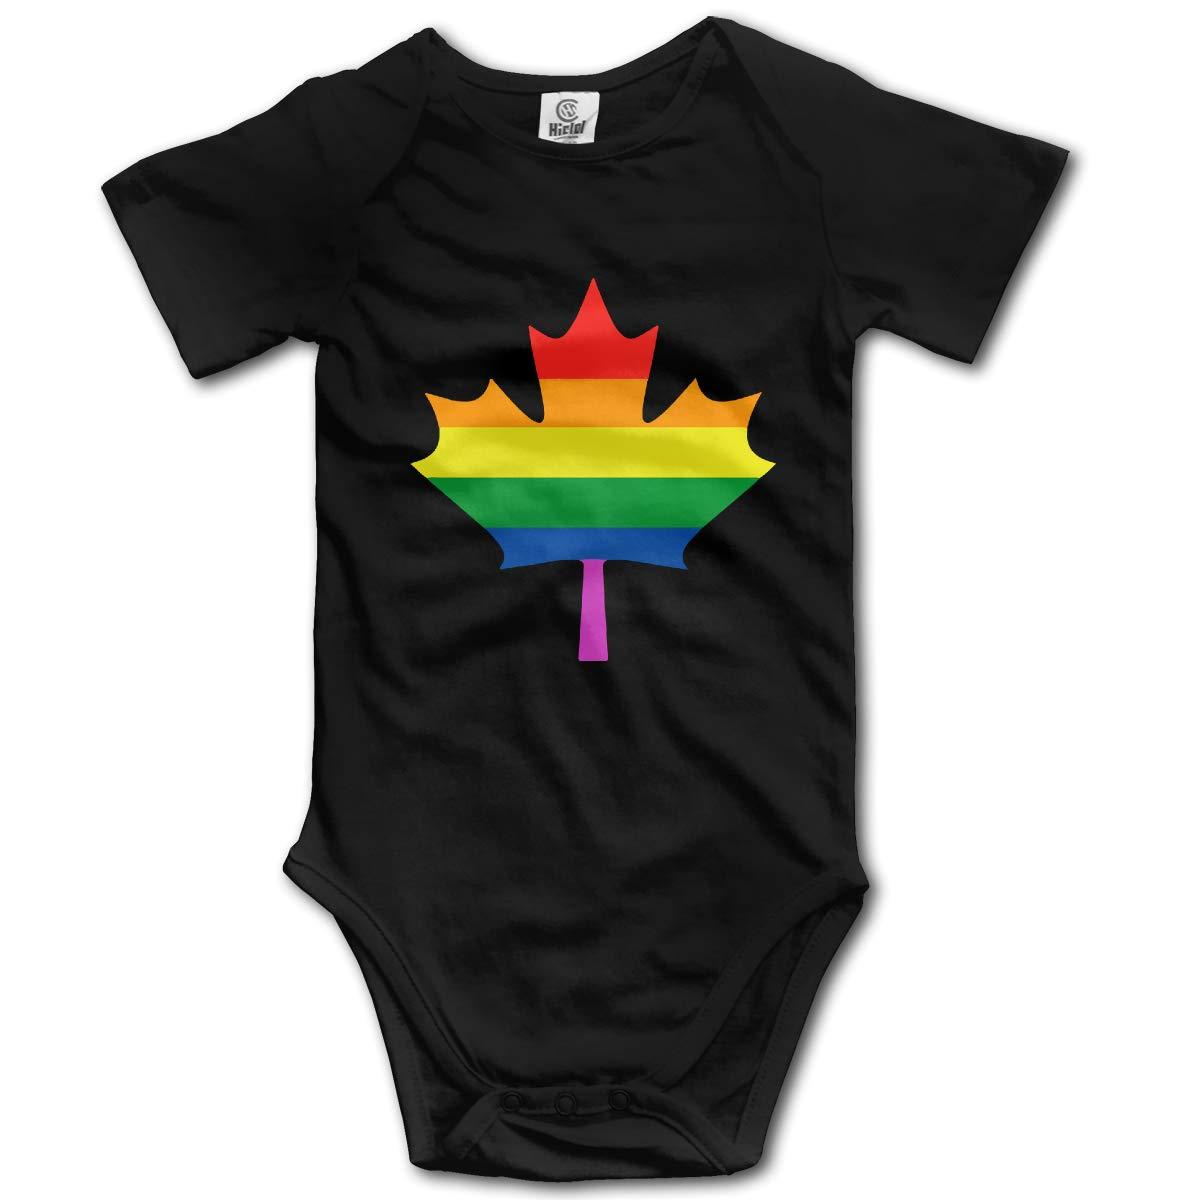 Canadian Rainbow Maple Leaf Unisex Solid Baby 100/% Organic Cotton Bodysuit Rompers 0-24M